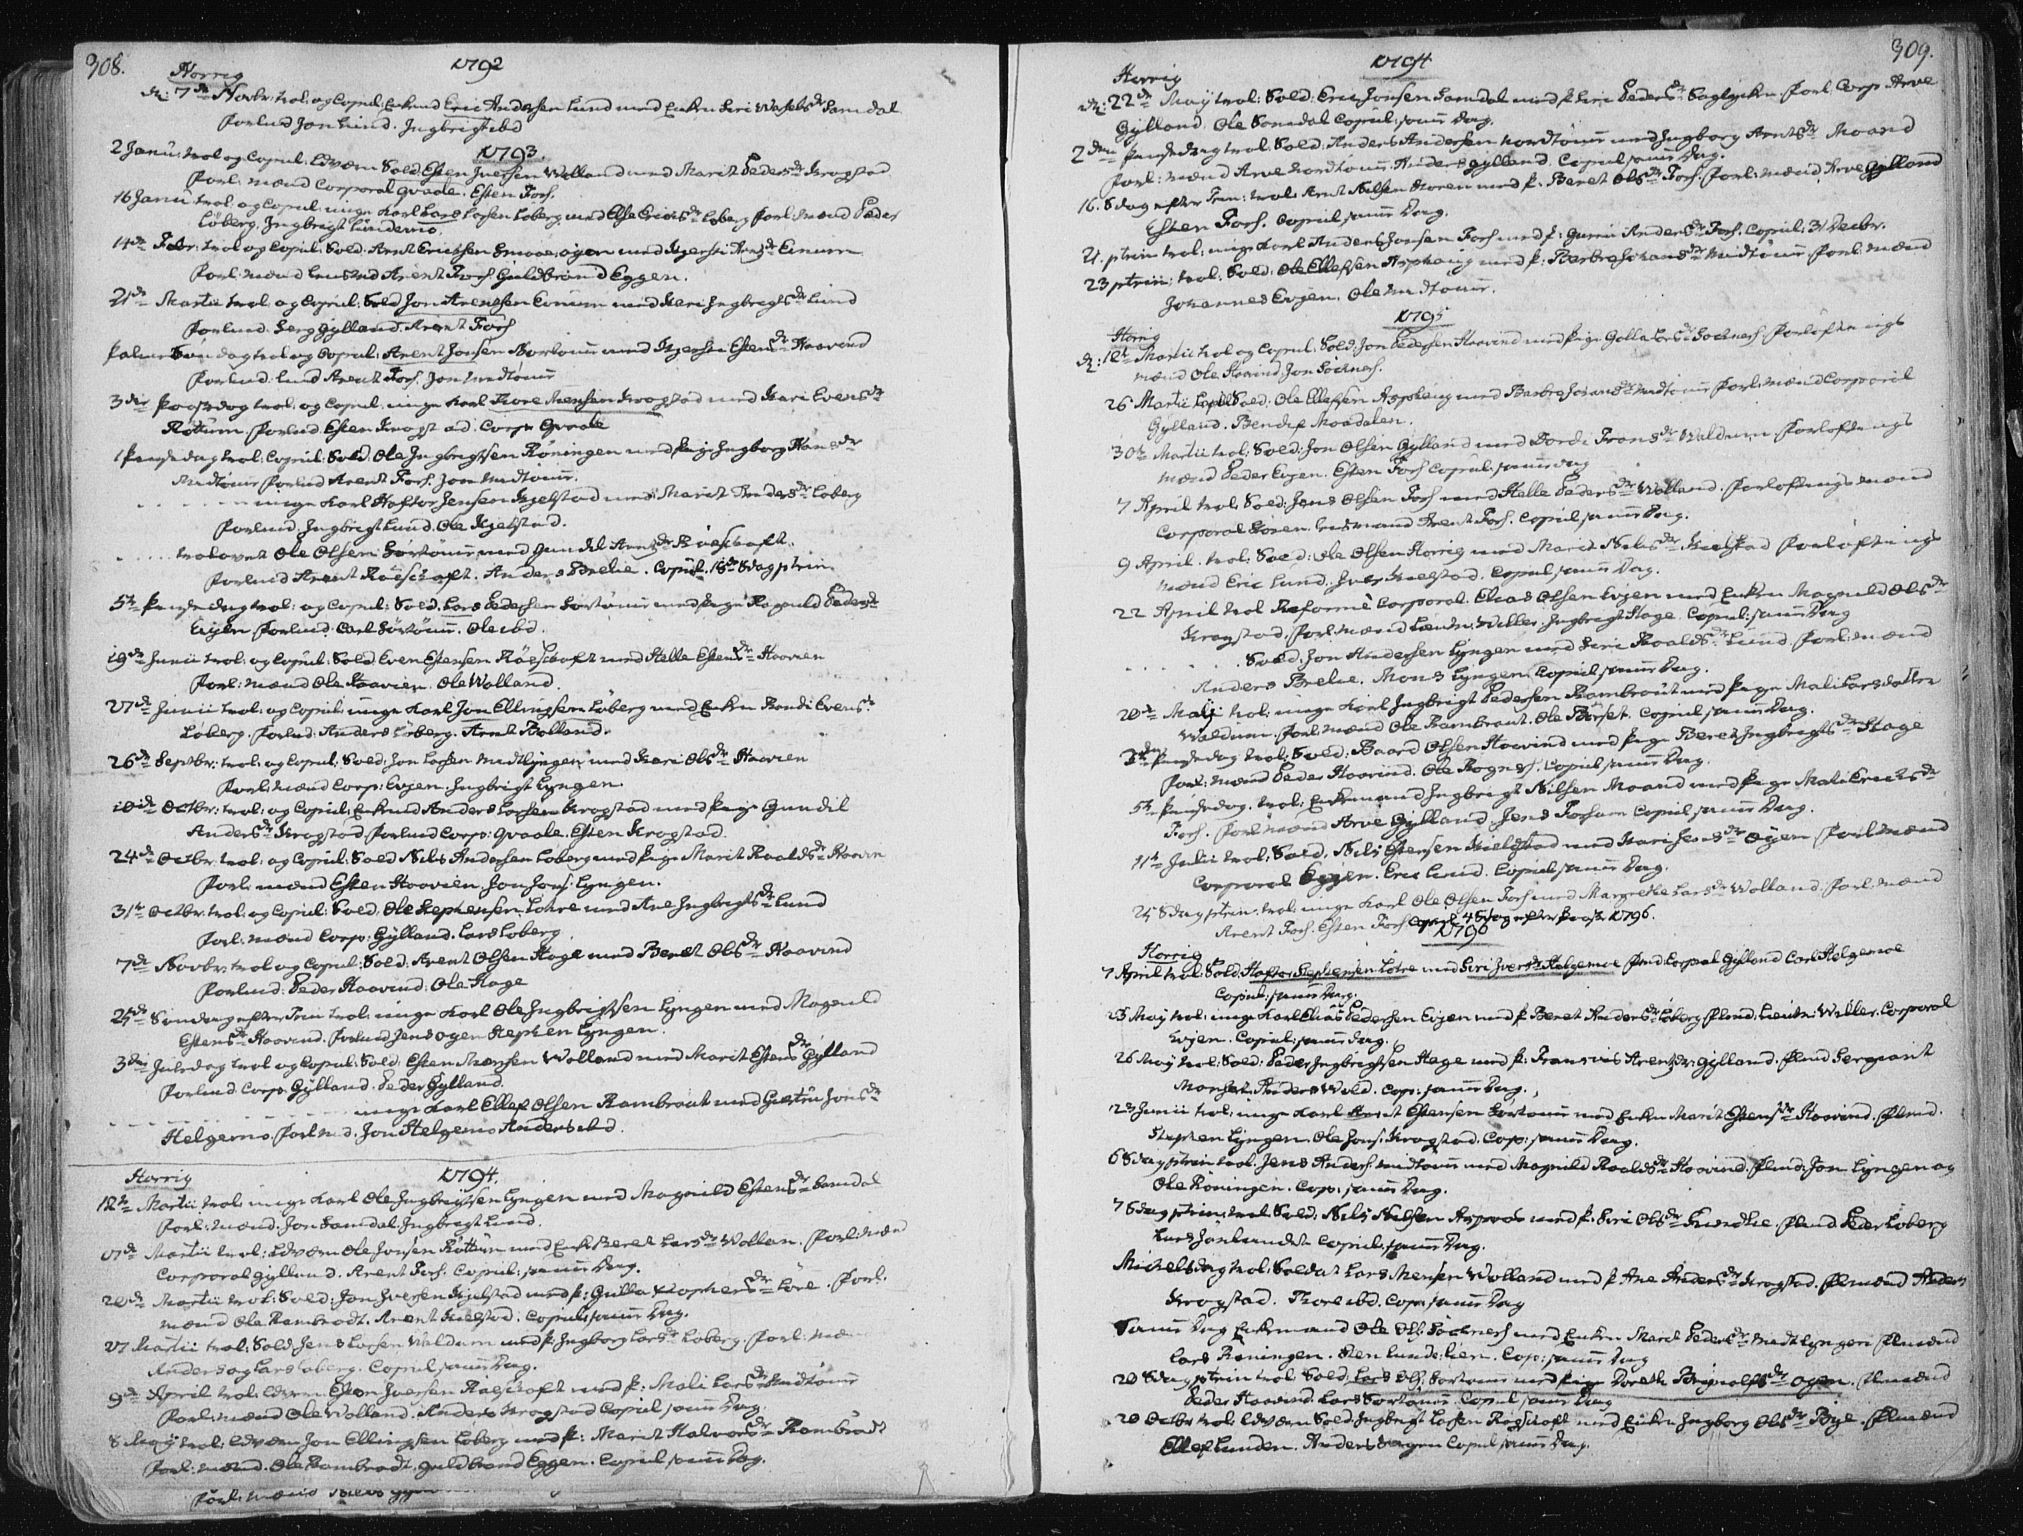 SAT, Ministerialprotokoller, klokkerbøker og fødselsregistre - Sør-Trøndelag, 687/L0992: Parish register (official) no. 687A03 /1, 1788-1815, p. 308-309